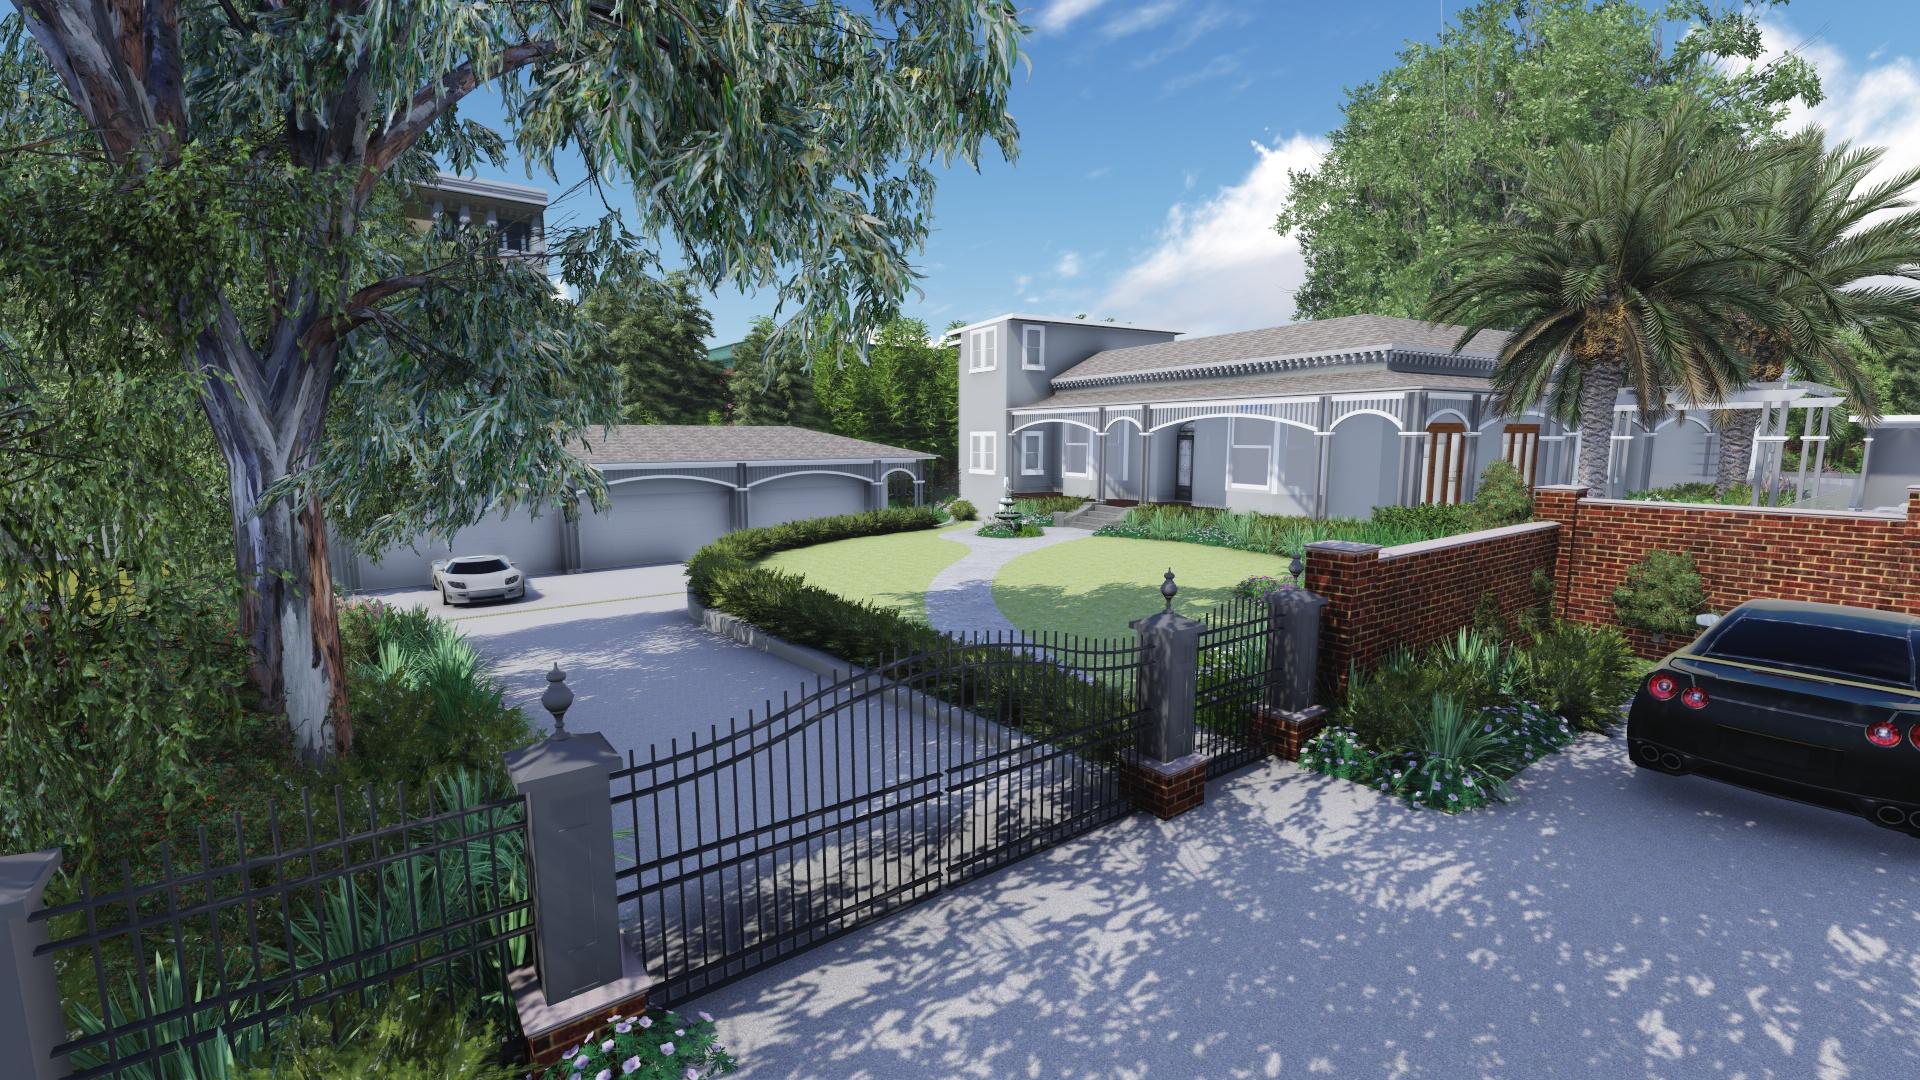 Punt-Road-Residence-Guymer-Bailey-Landscape-01.jpg